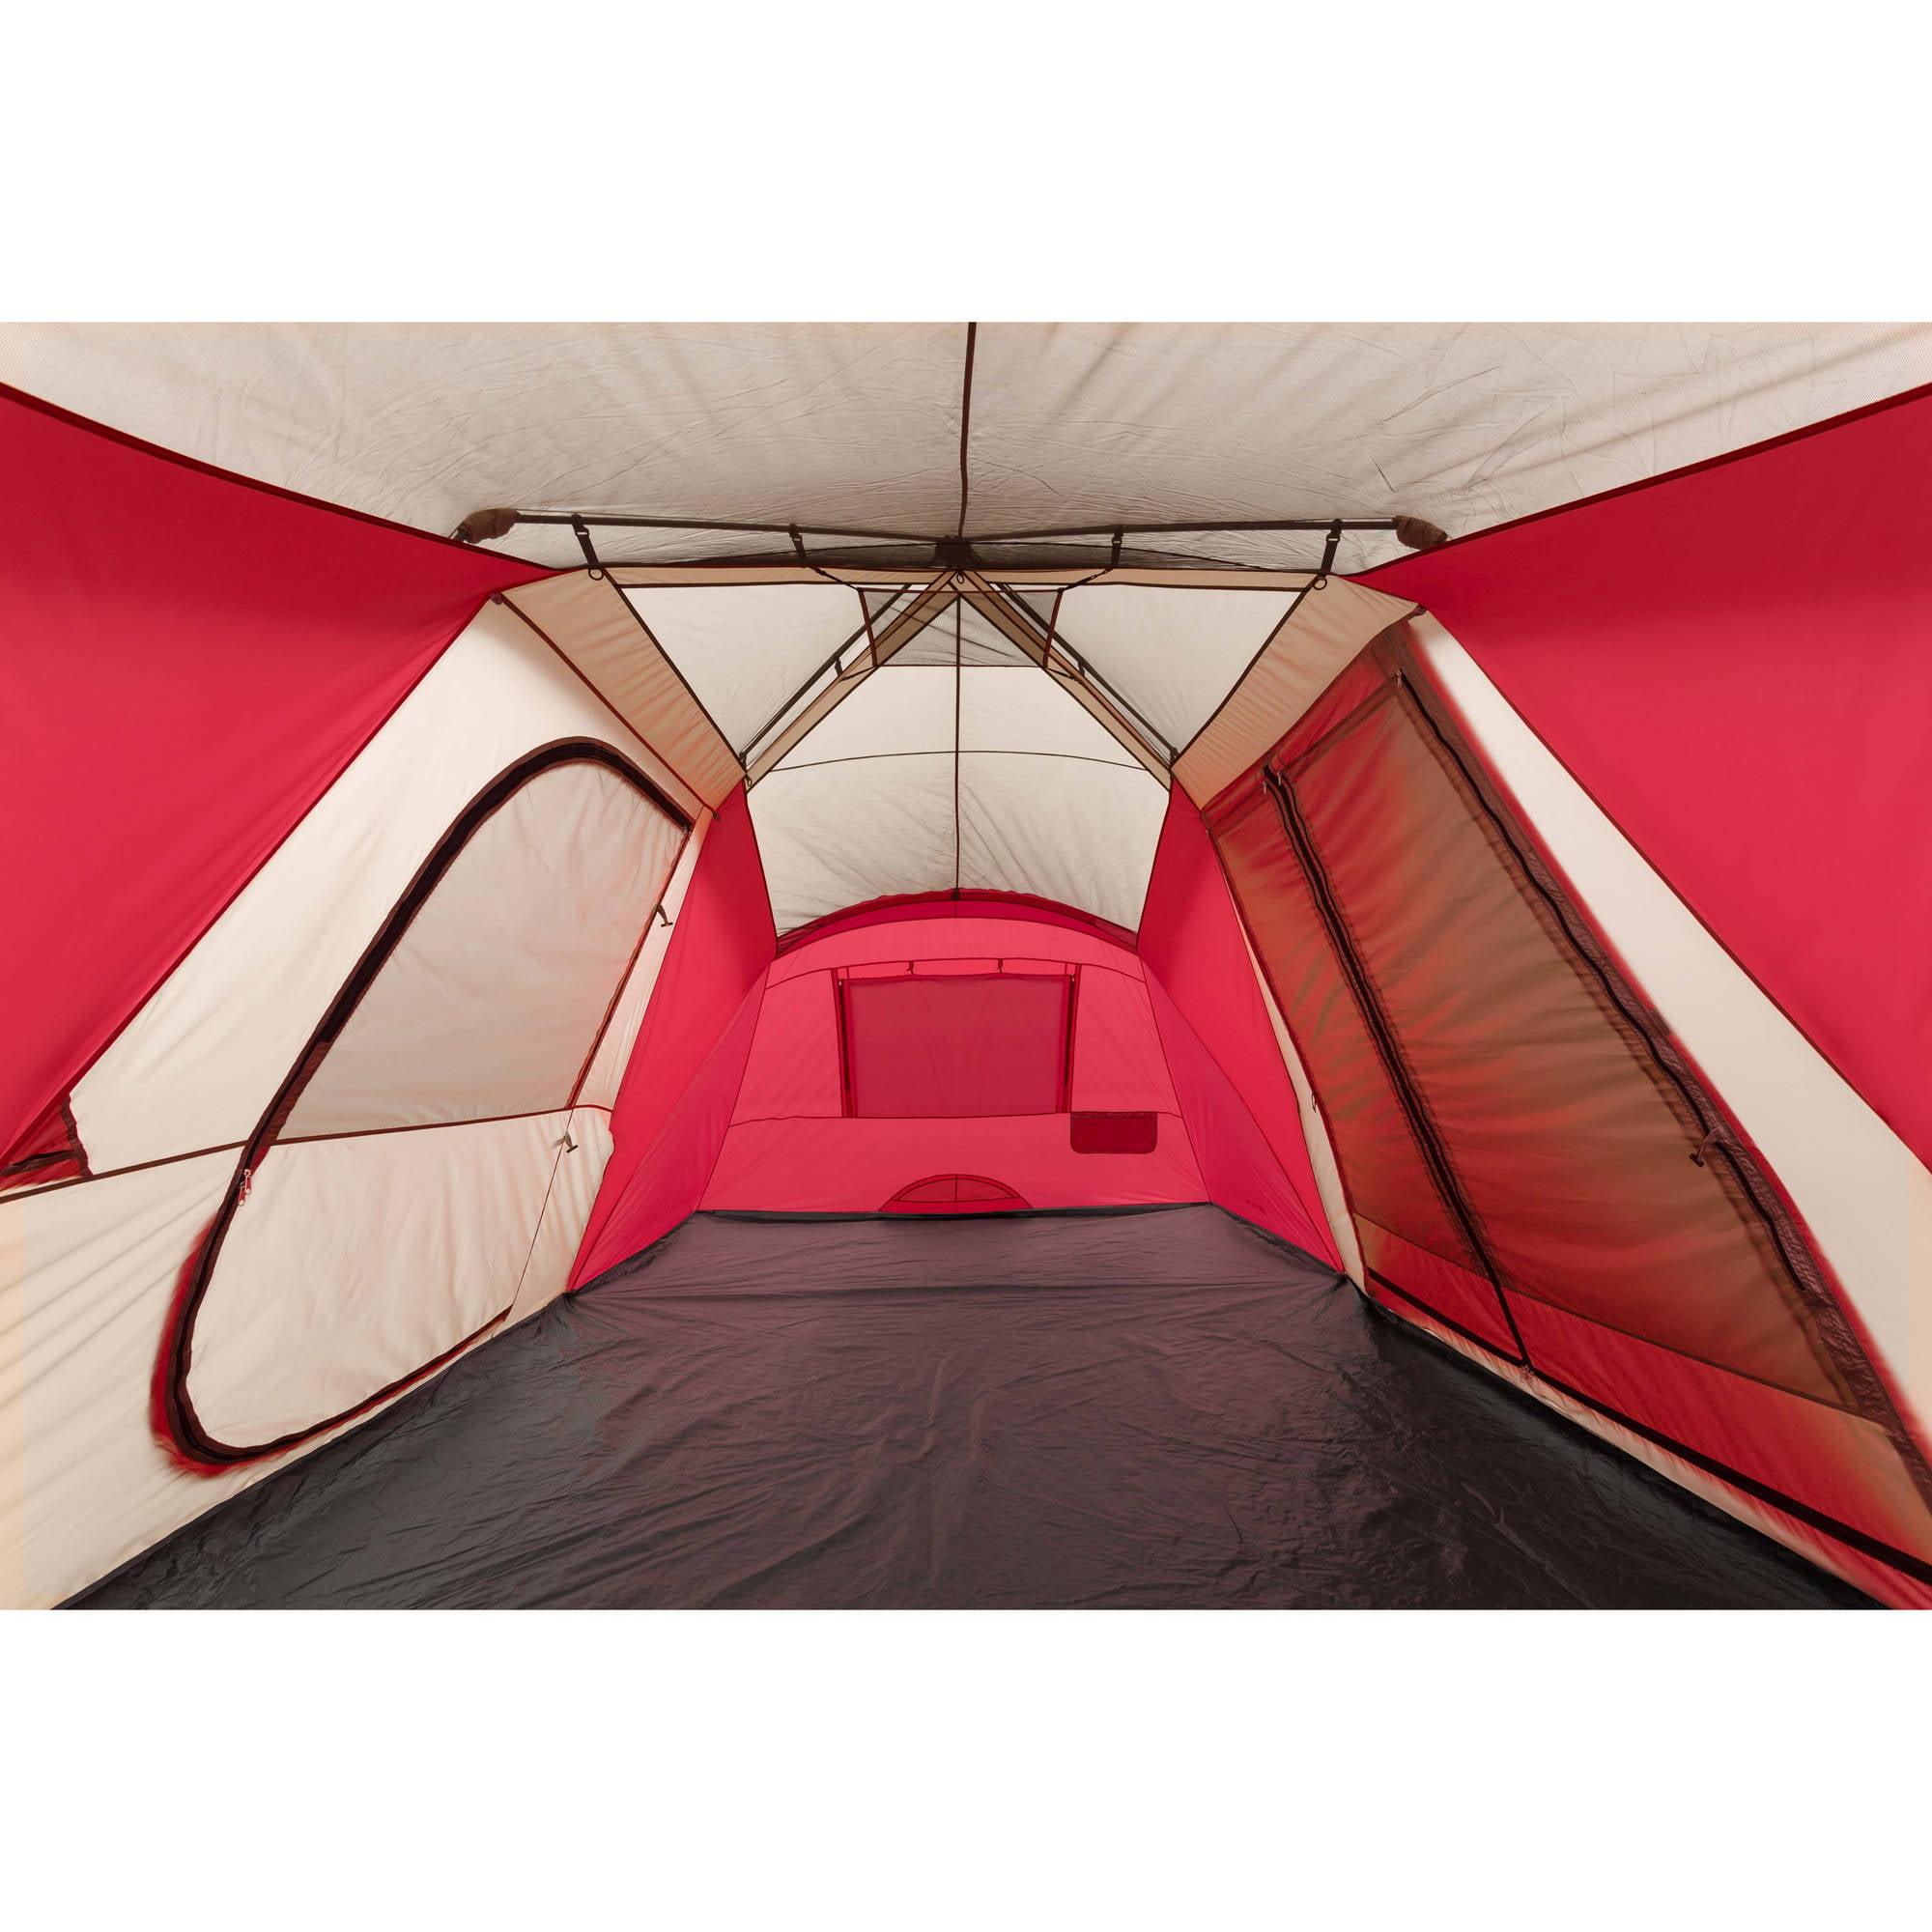 Ozark Trail 21u0027 X 10u0027 3 Room Instant Tent With Awning, Sleeps 12, Red    Walmart.com